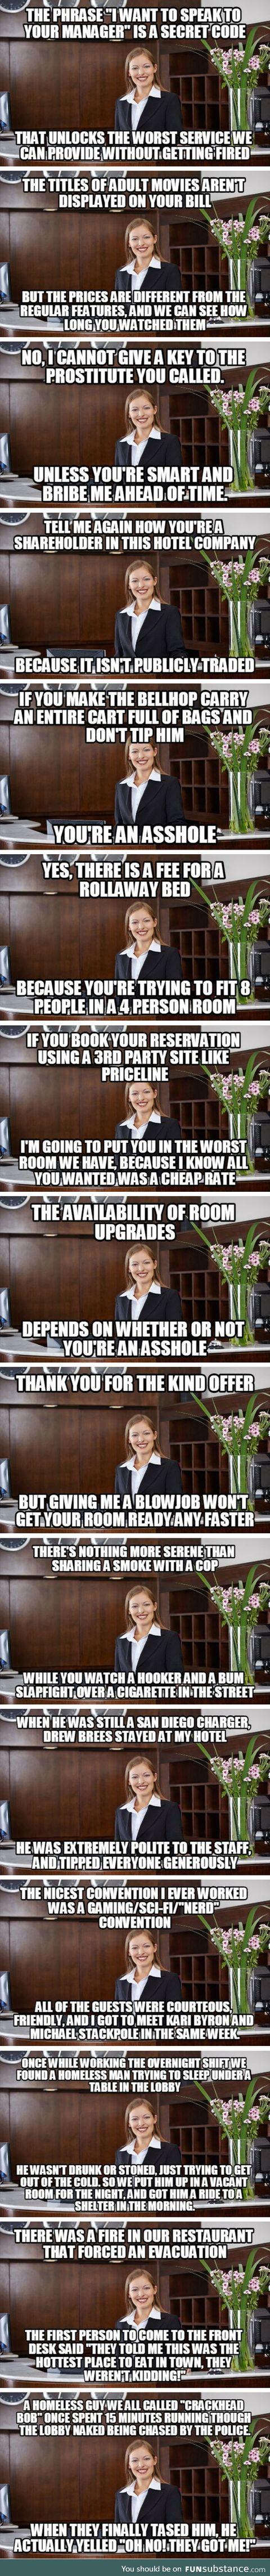 Hotel management 1-2